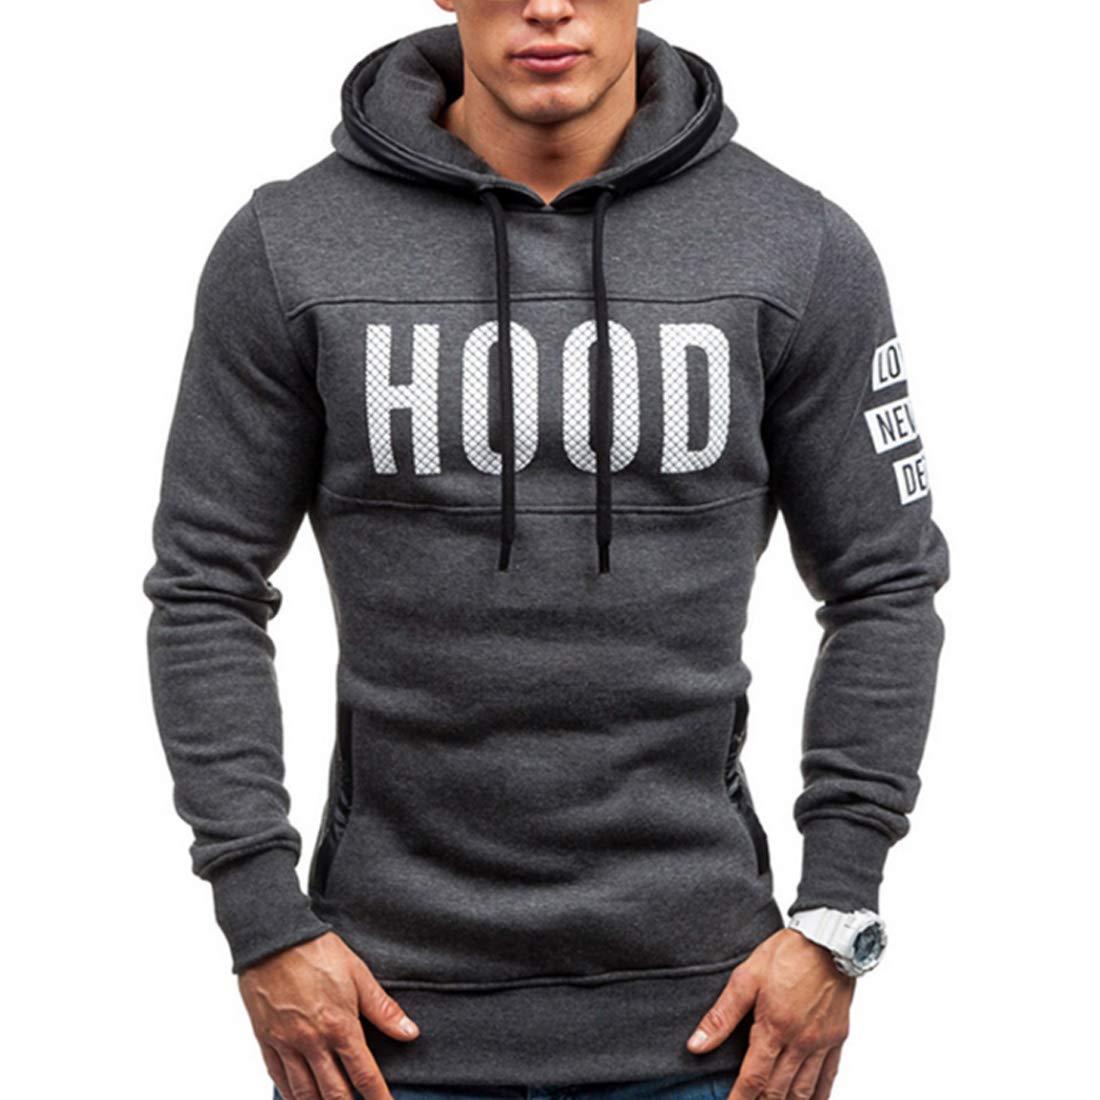 Aiweijia Mens Hooded Sweatshirts Spring Autumn Man Coat Outwear